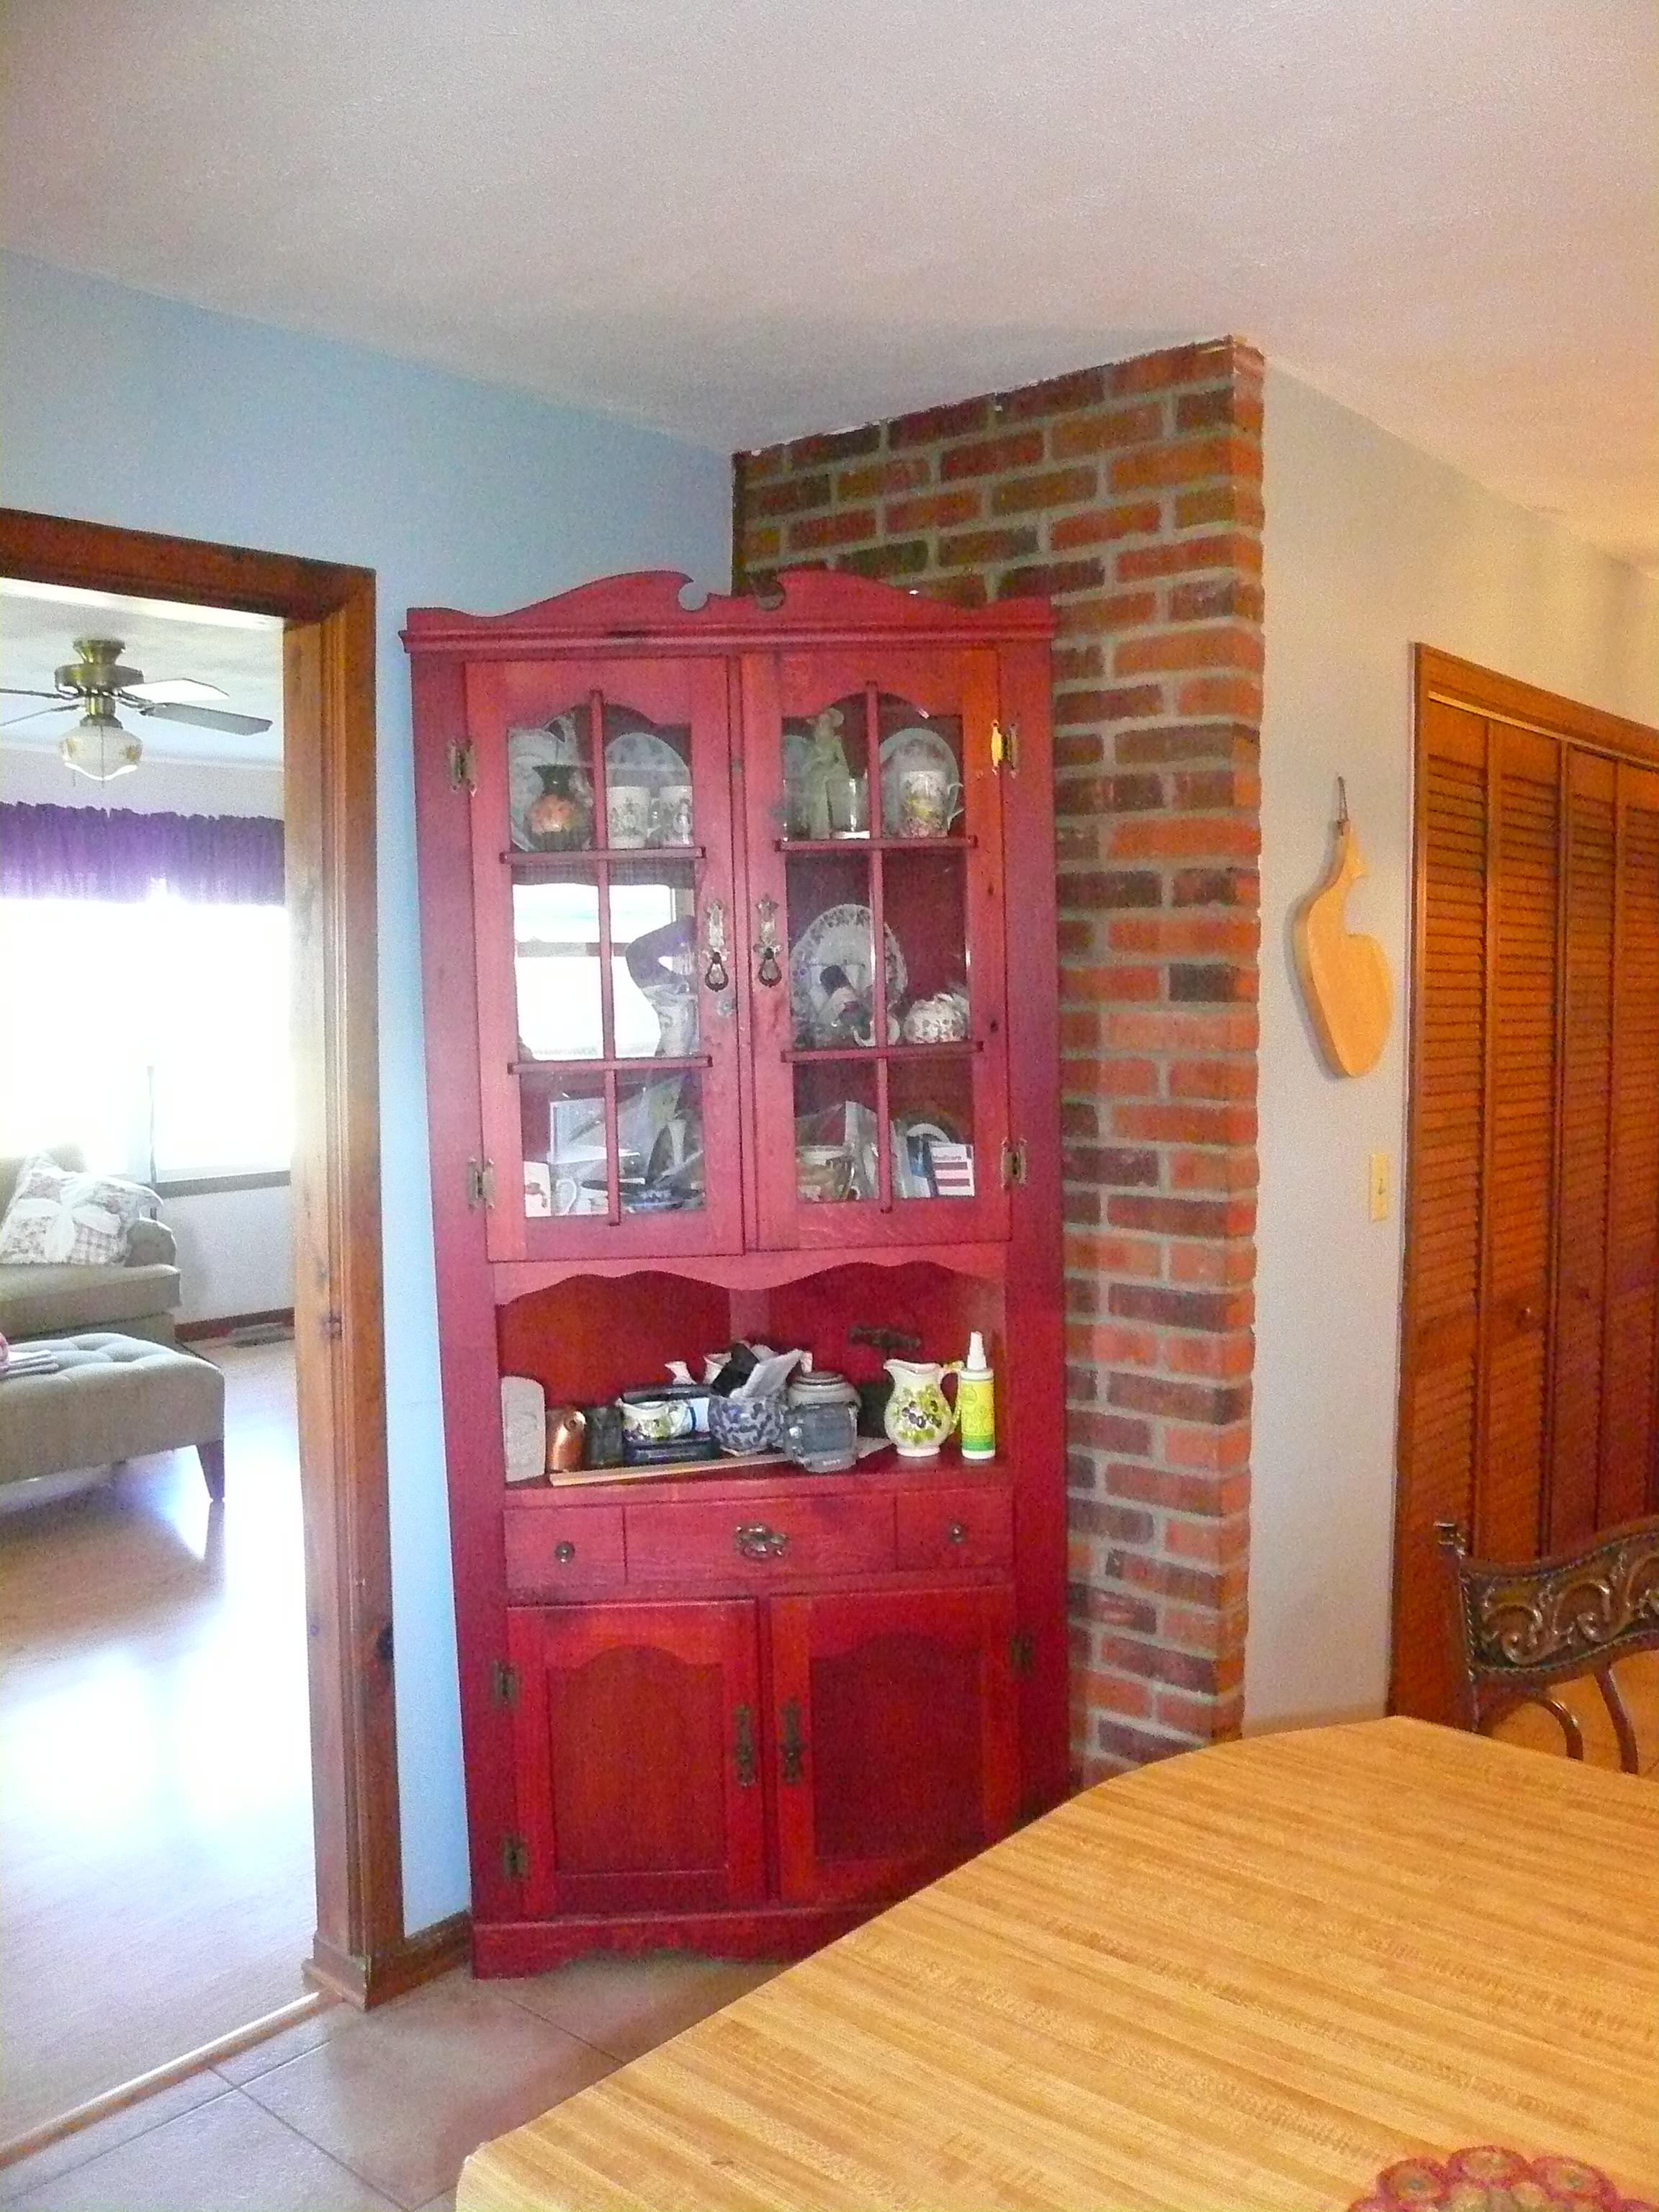 Kitchen Remodel Cost Near Redlands Cal